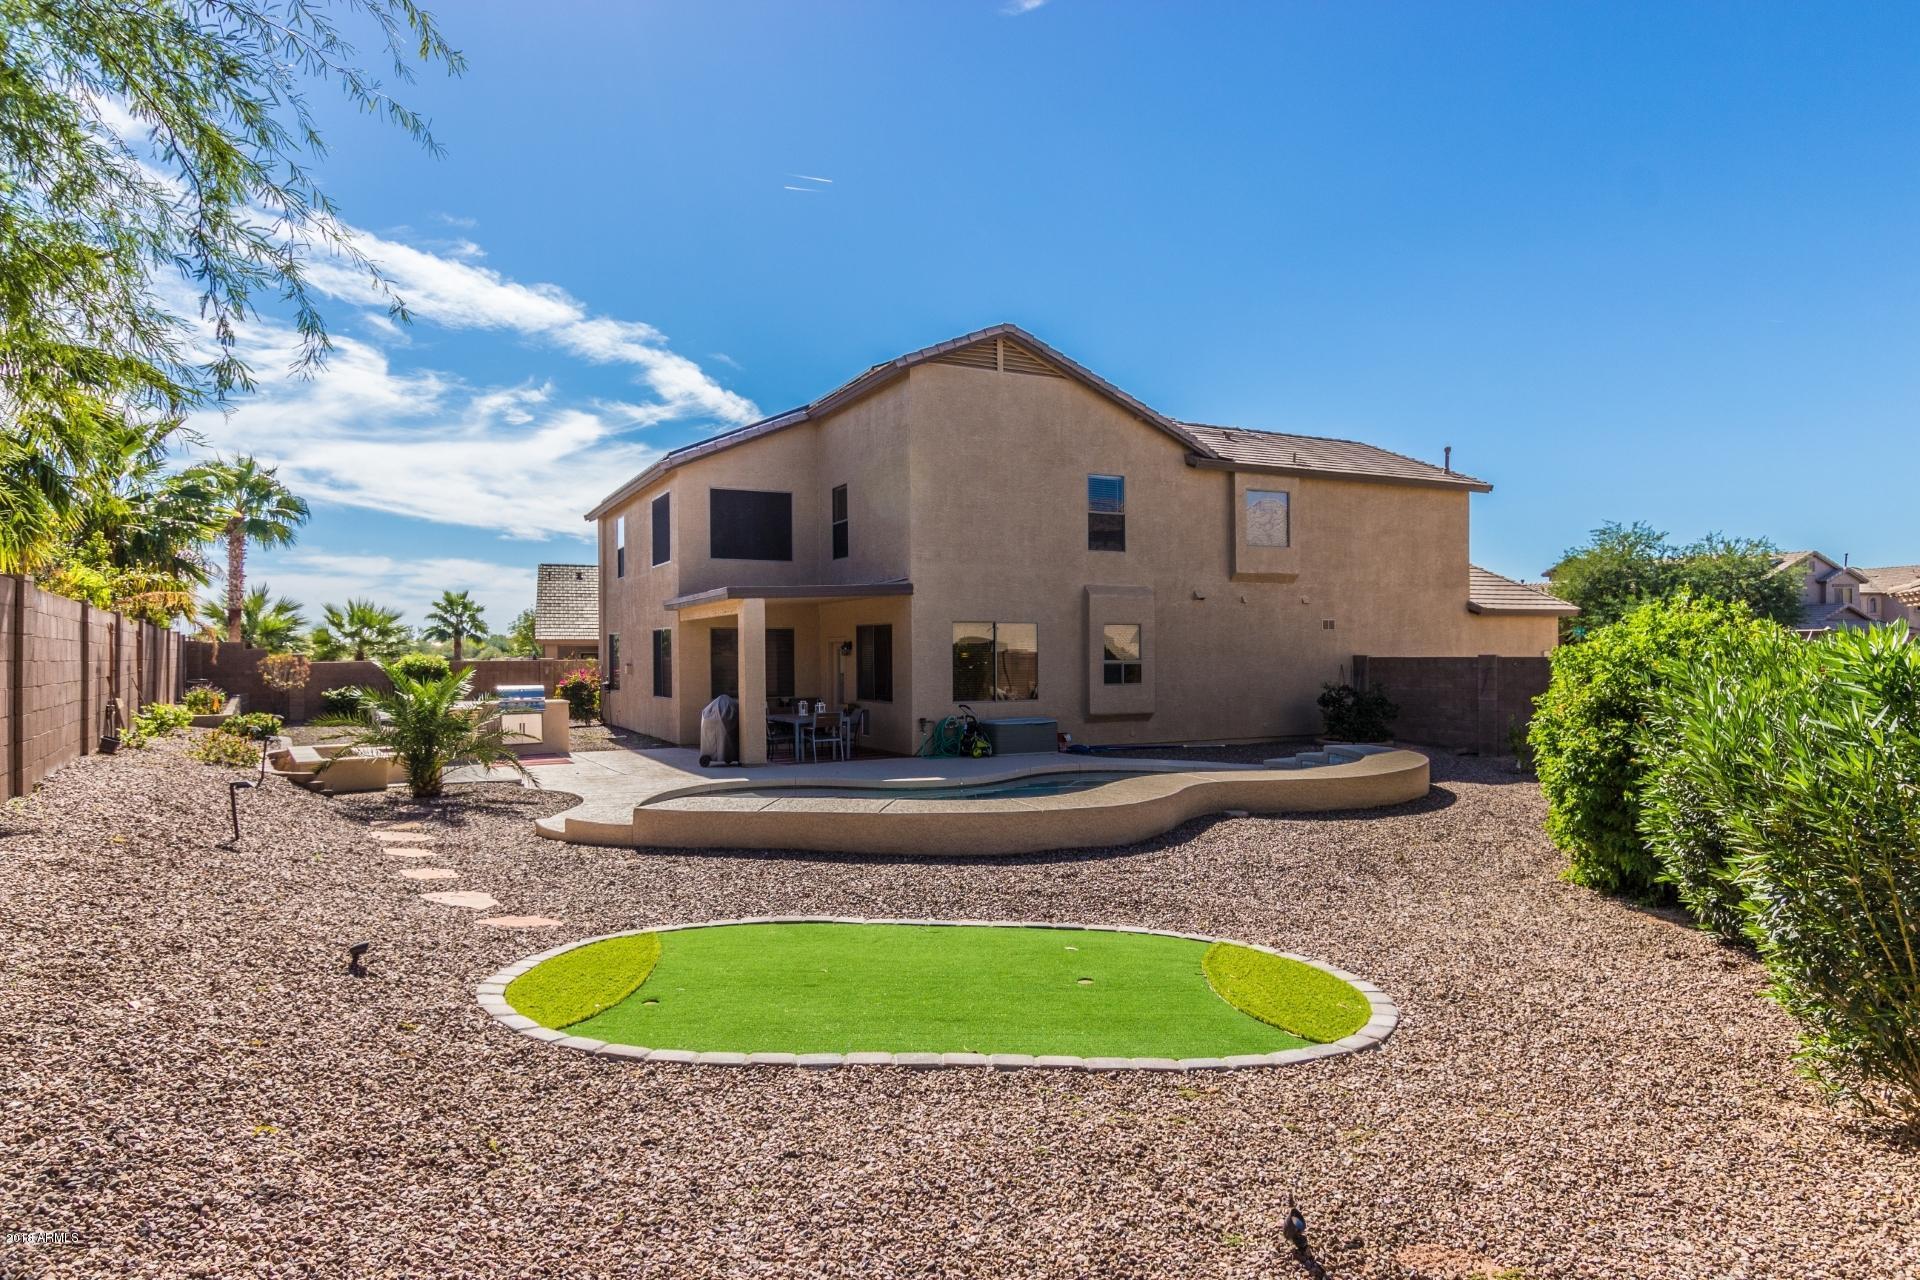 MLS 5909140 21985 N BACKUS Drive, Maricopa, AZ 85138 Maricopa AZ Rancho El Dorado